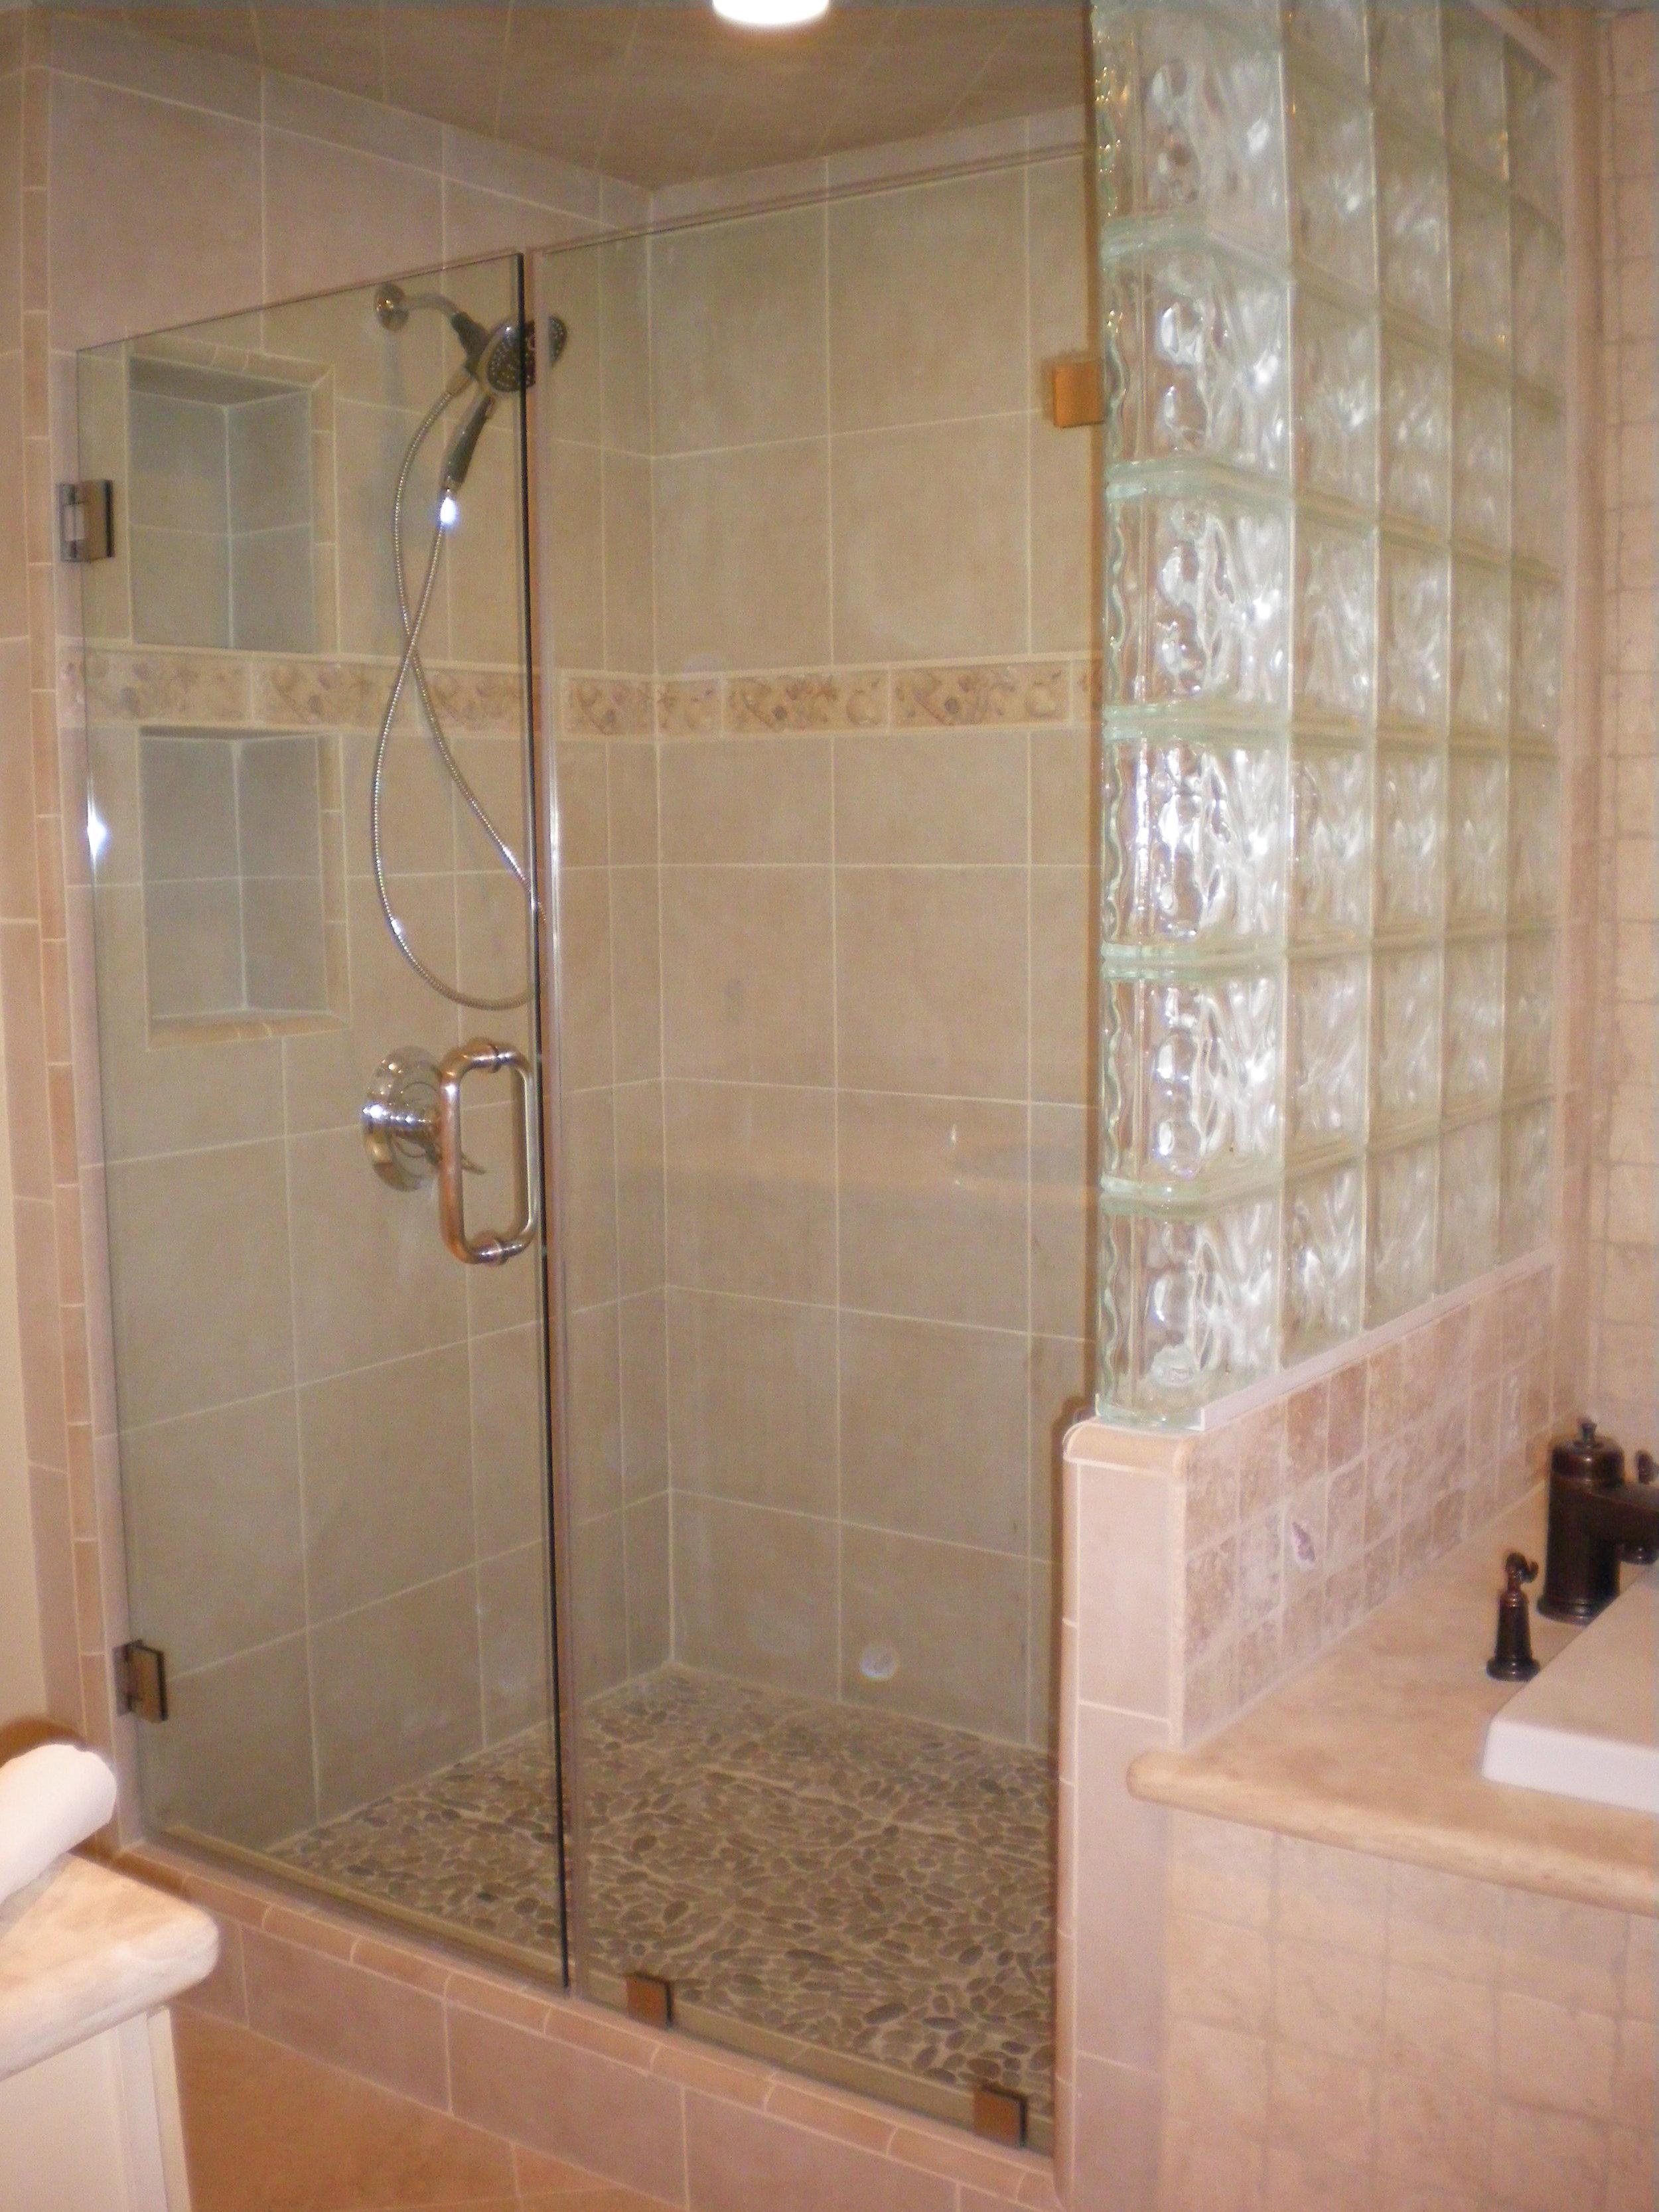 Shower-Doors-Residential-Photos-2.jpg